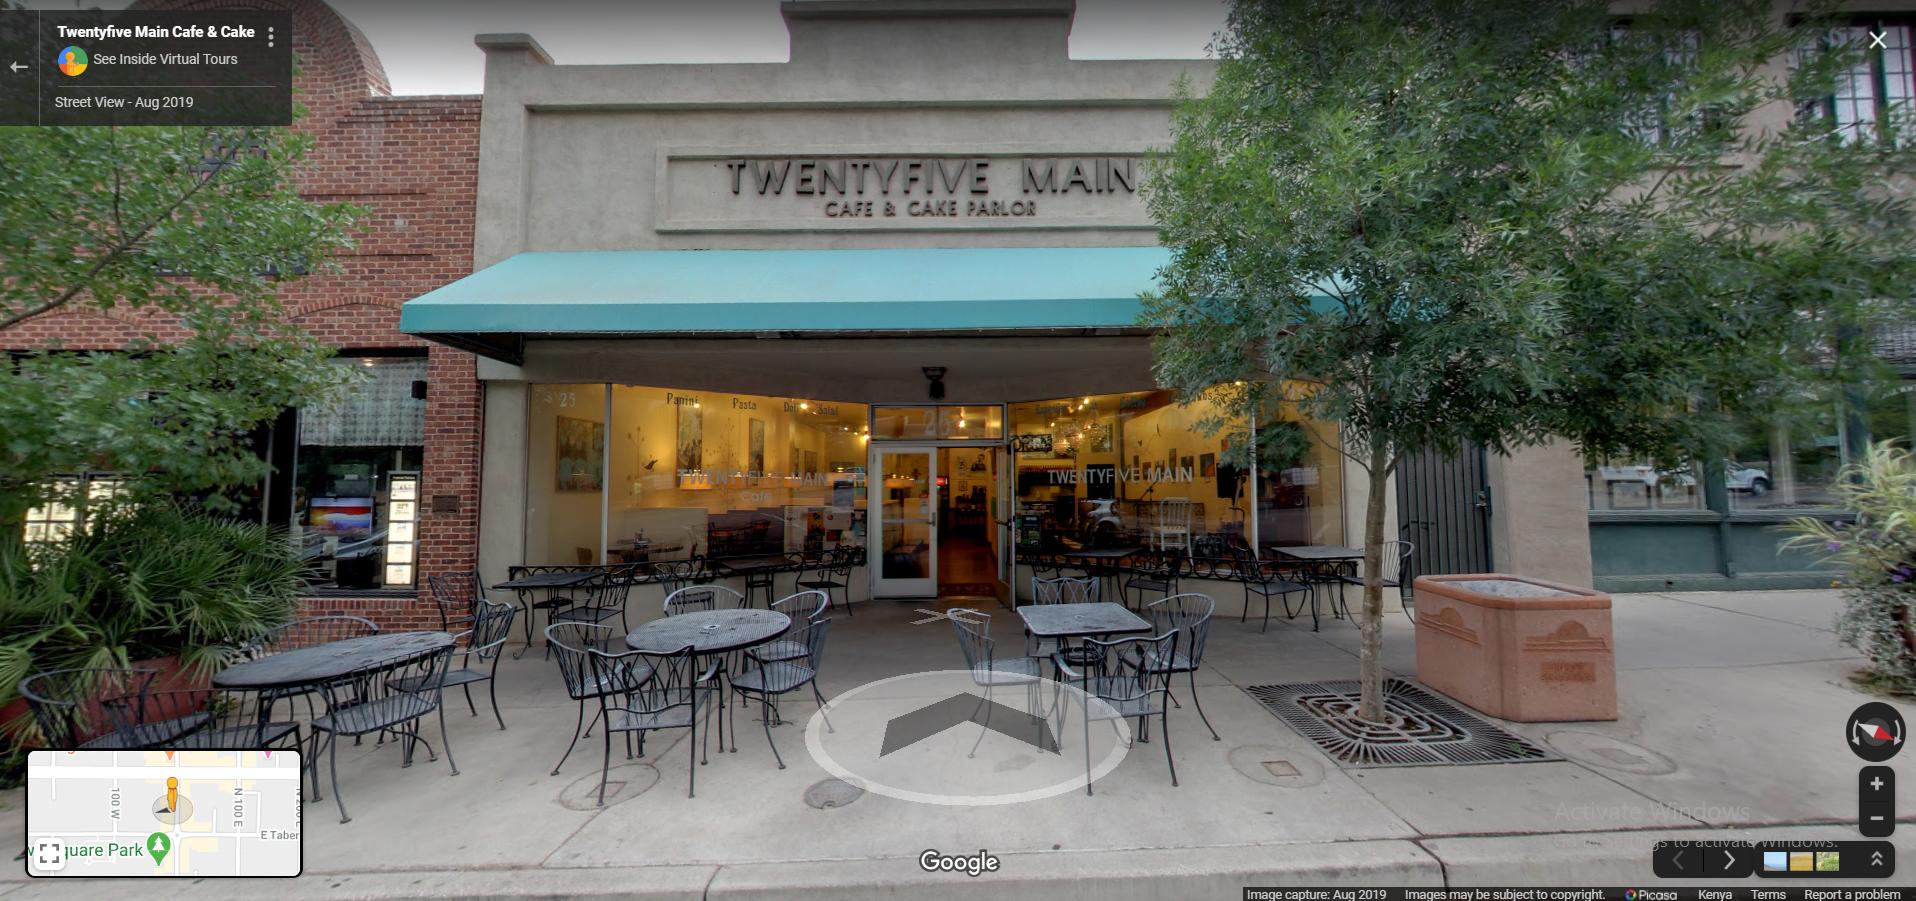 Twentyfive Main Cafe & Cake - St. George